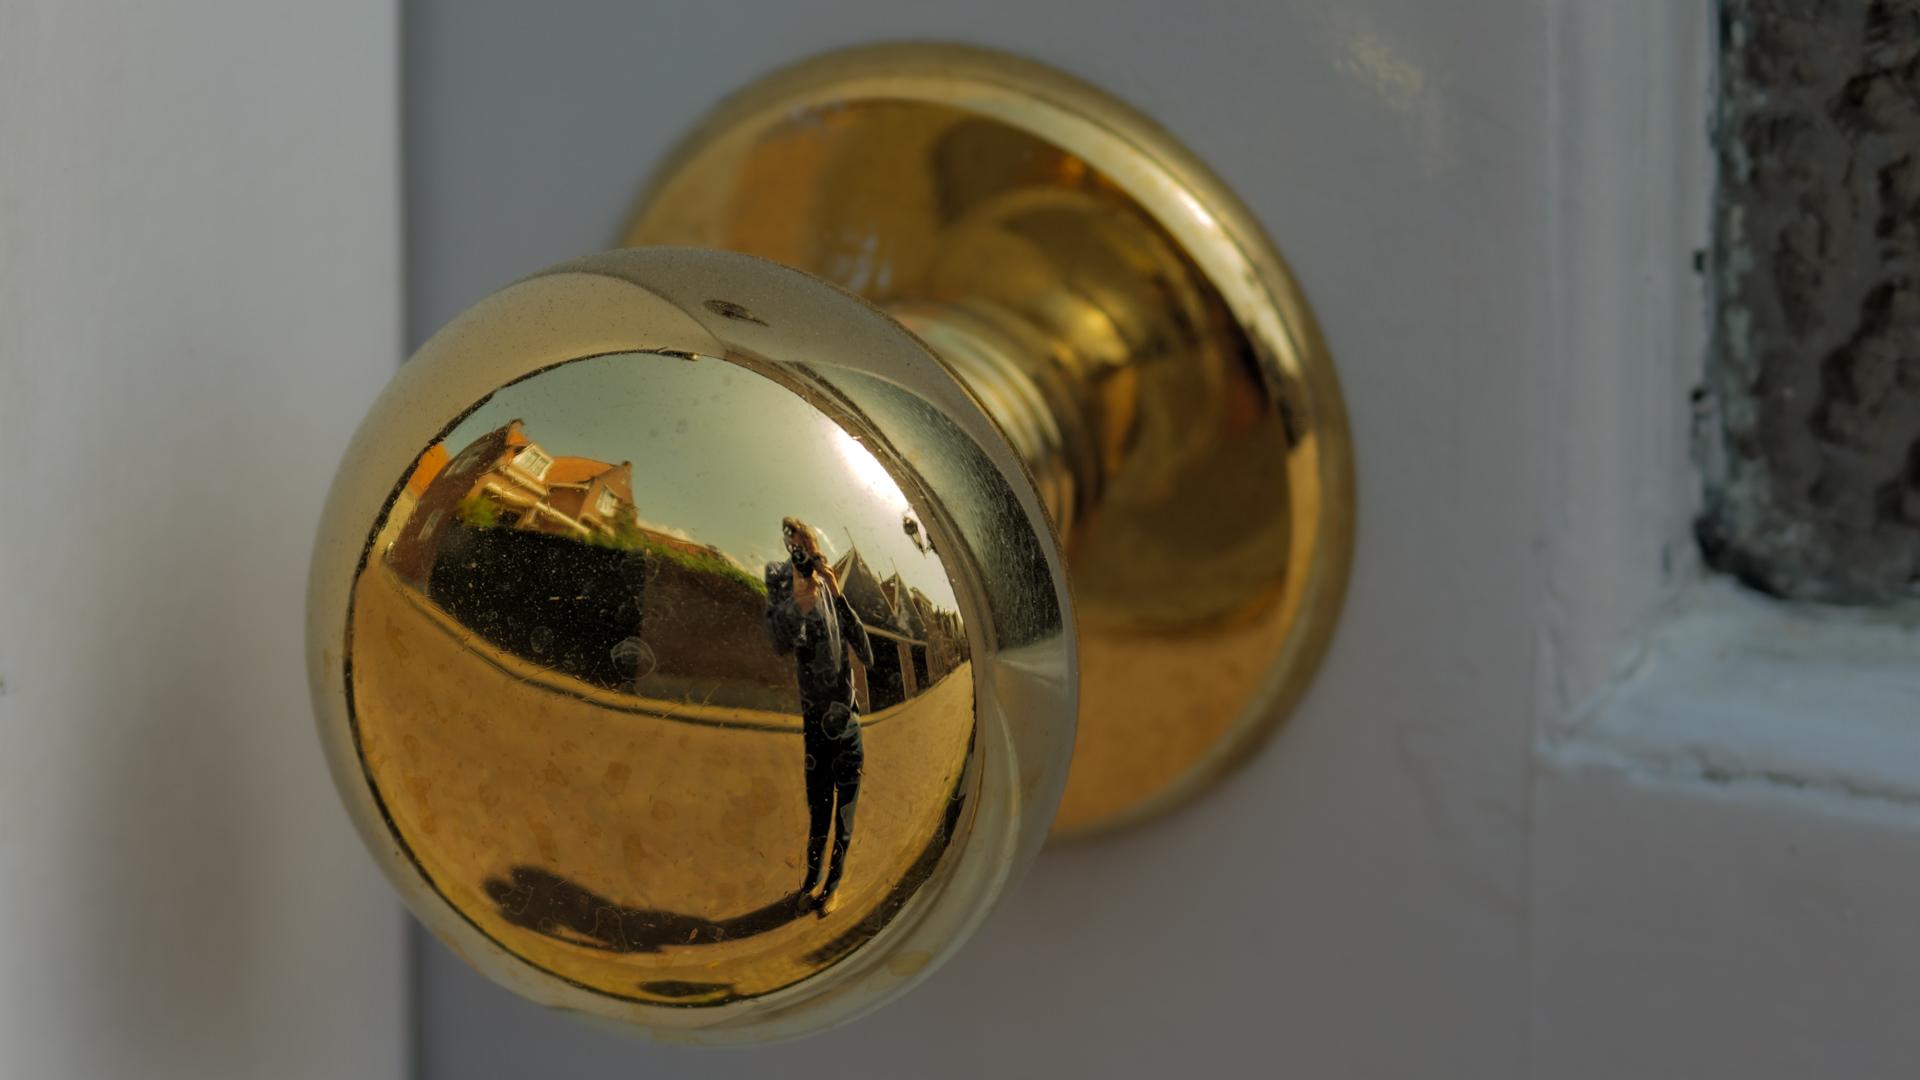 Doorknob in Edam: Panasonic 70-200mm f/4 OIS LUMIX S PRO sample image